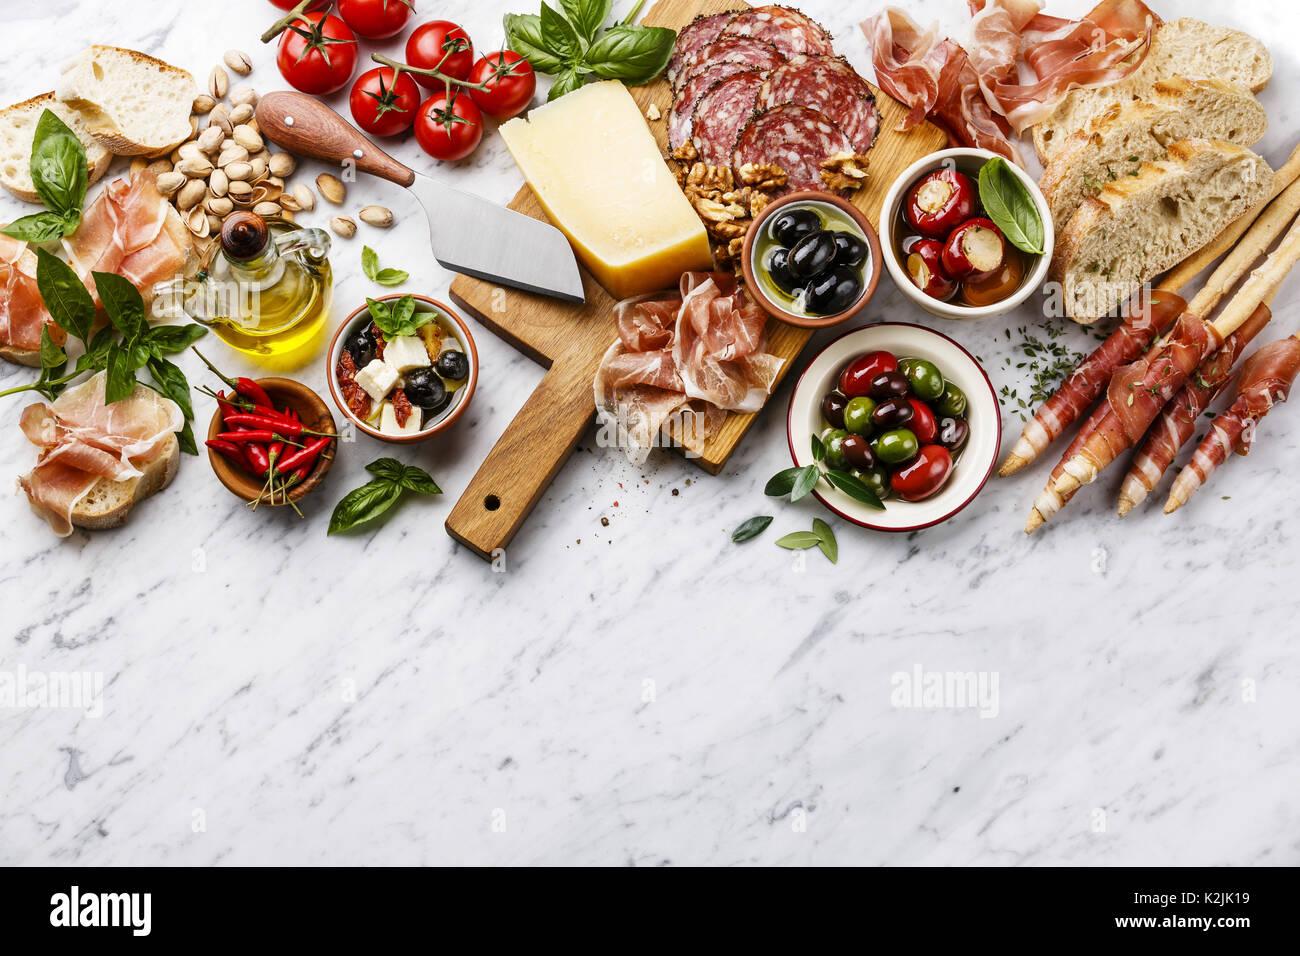 italienische snacks essen mit schinken geschnittenem brot. Black Bedroom Furniture Sets. Home Design Ideas